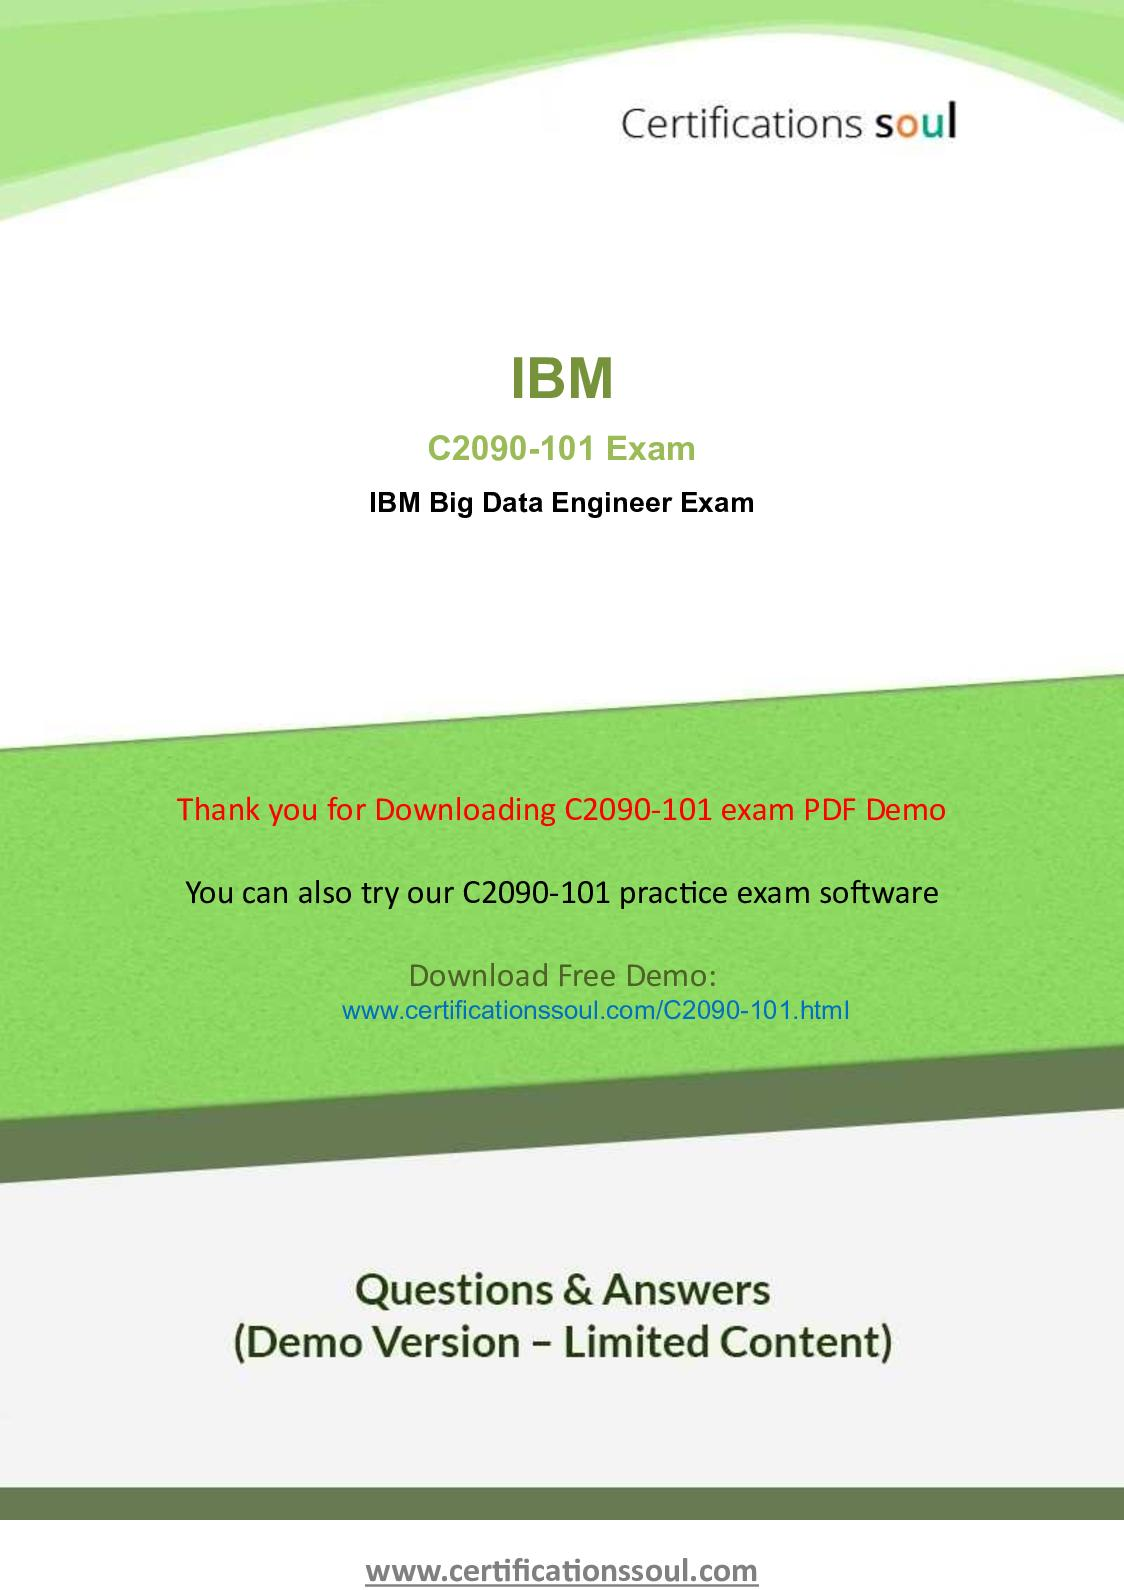 Calaméo - C2090 101 Practice Exam Question